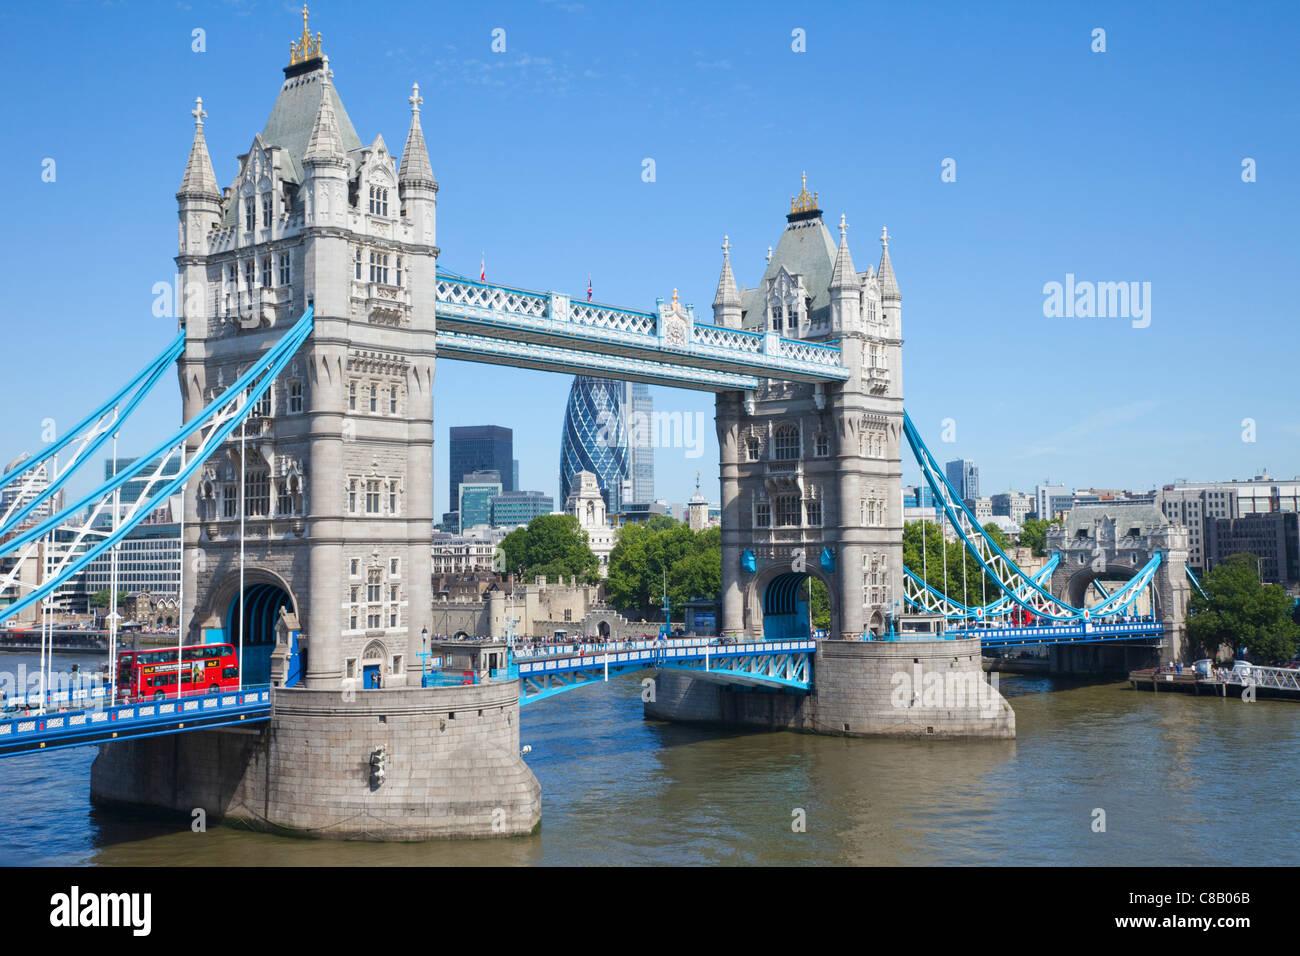 England, London, Tower Bridge Stockbild